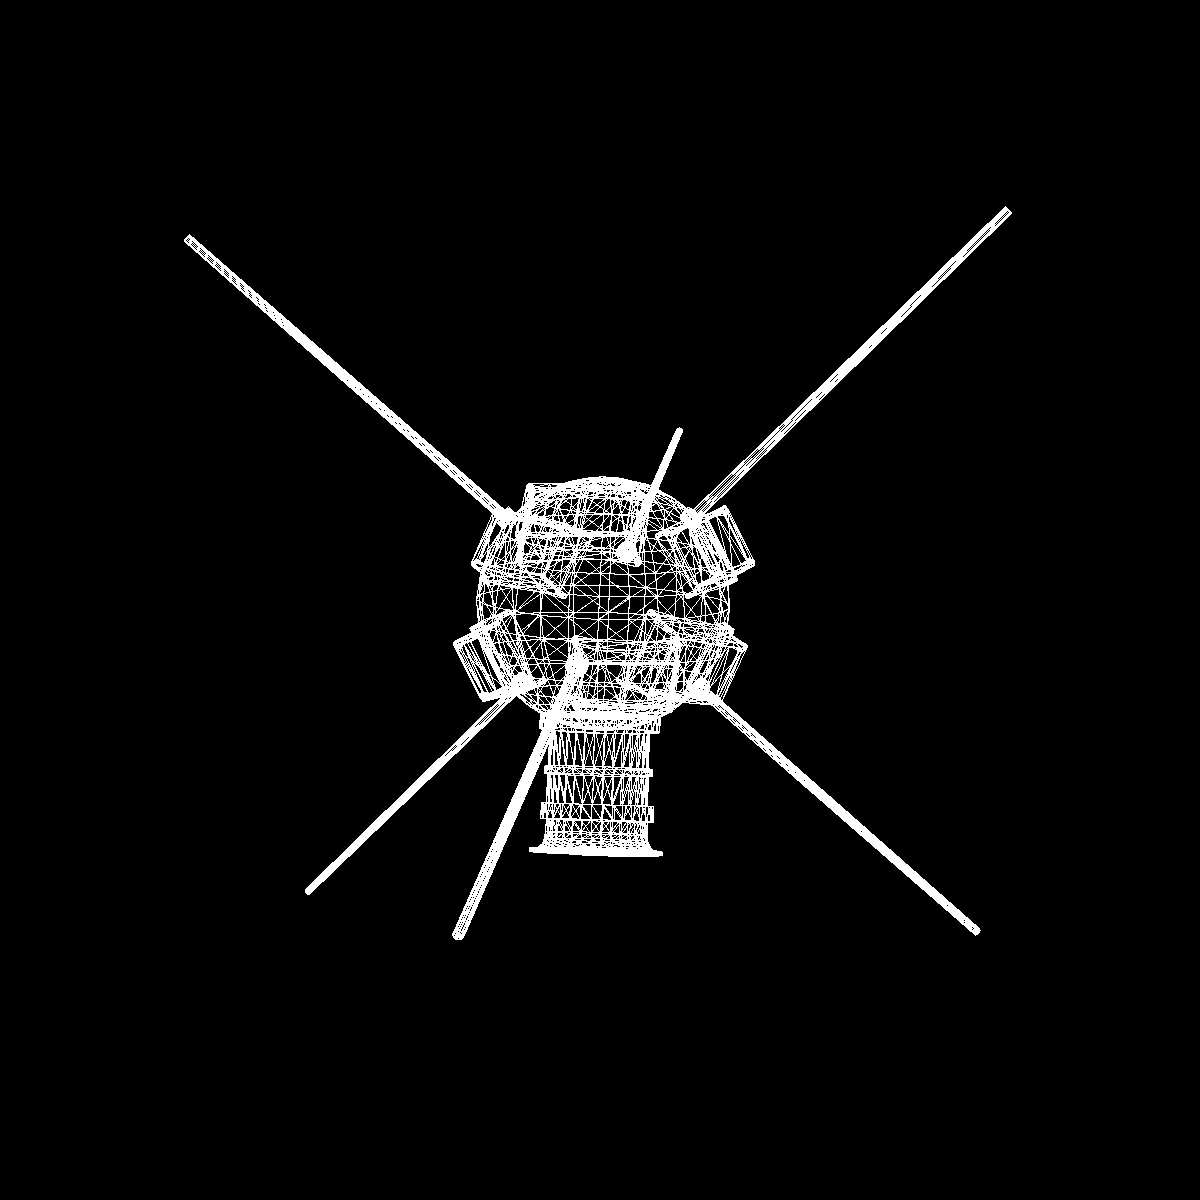 vanguard i satellite 3d model 3ds dxf fbx blend cob dae x obj 163935